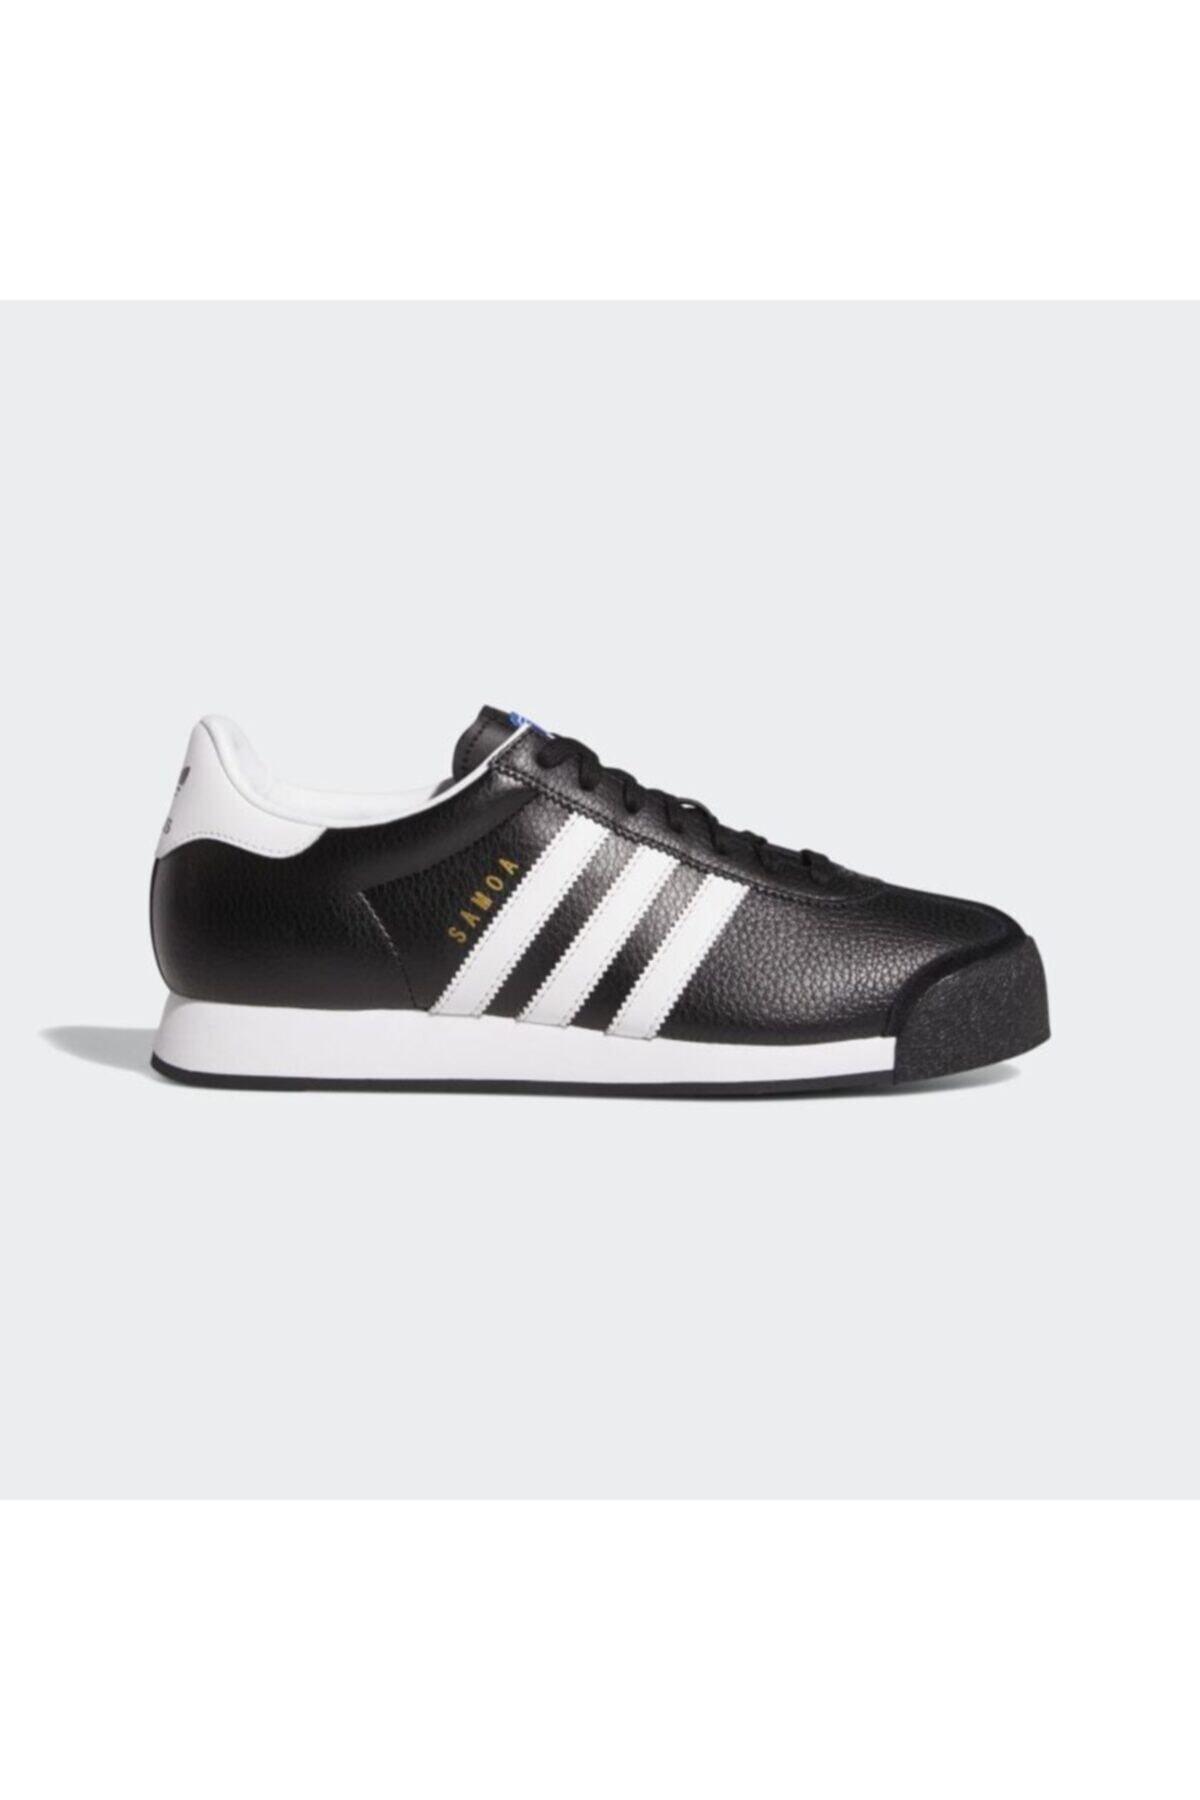 کفش مخصوص پیاده روی اورجینال برند آدیداس رنگ مشکی کد ty33345935